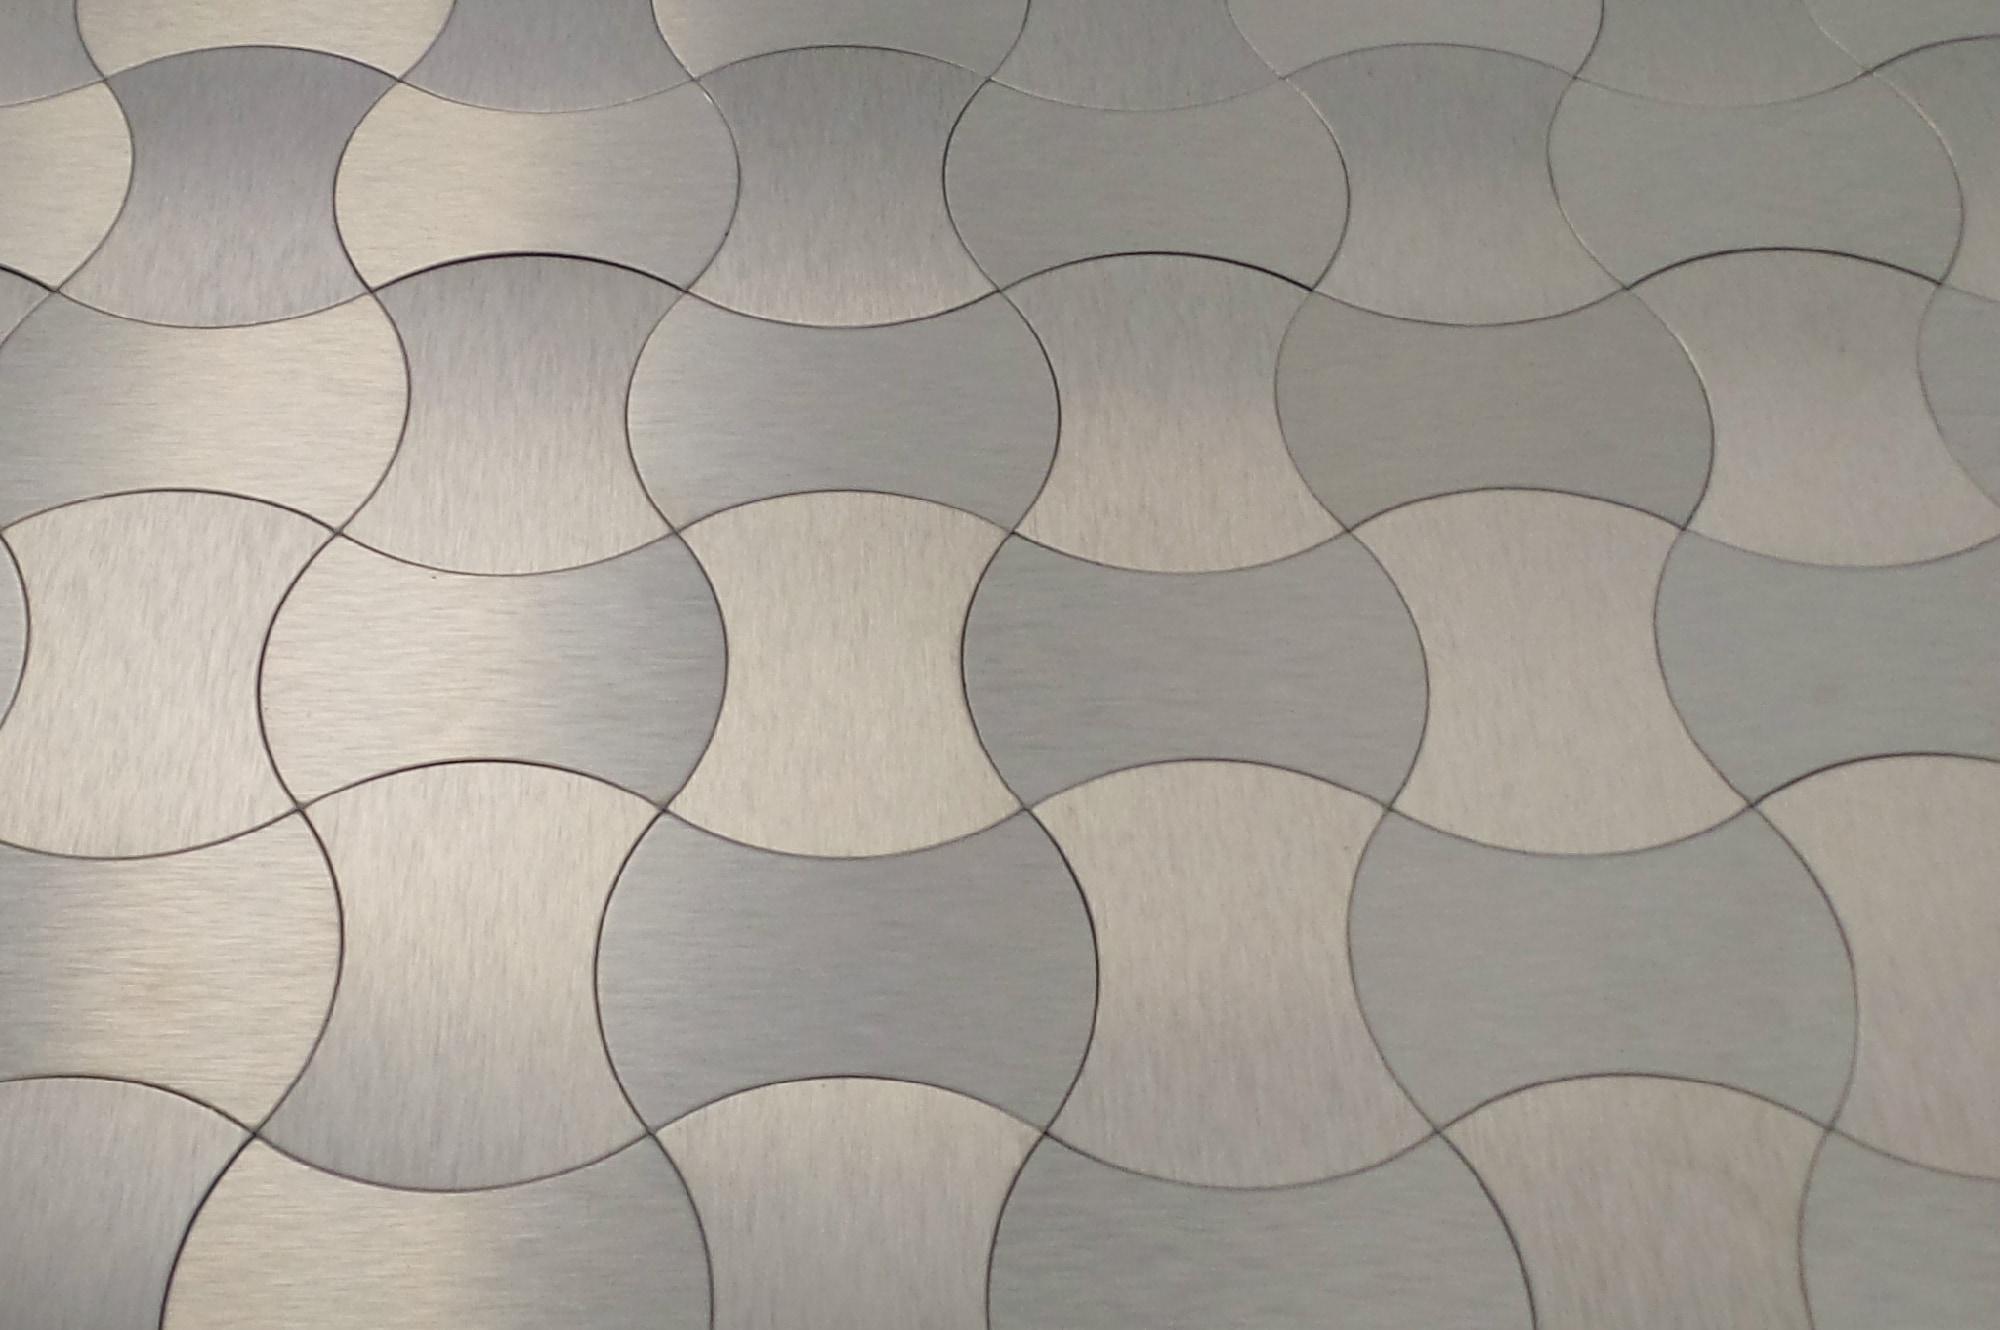 gl stone & tile mosaic tile - peel & stick metal series gold wave